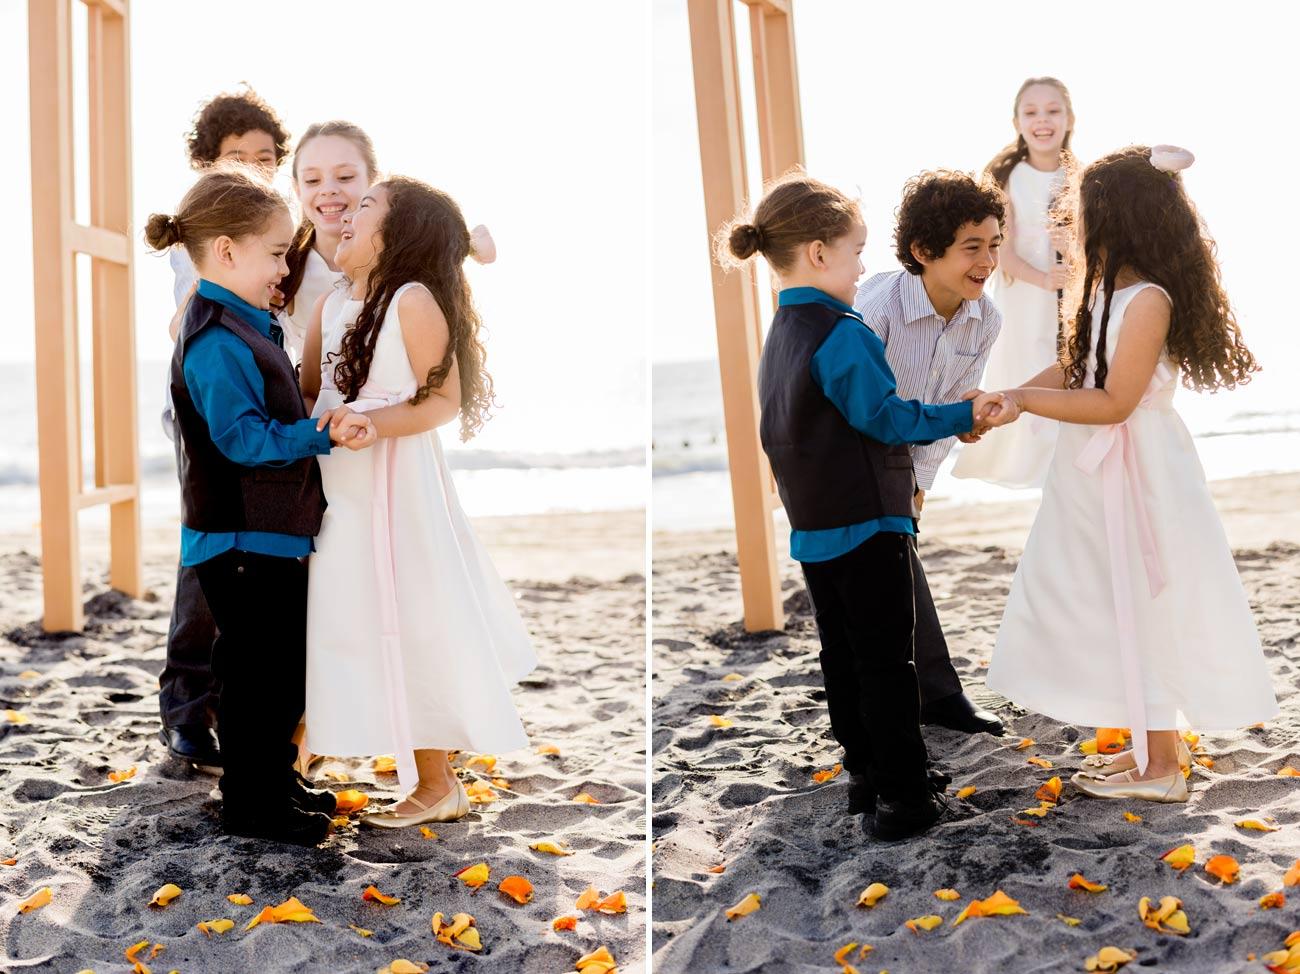 mairin_mike_levyland_wedding_044.JPG